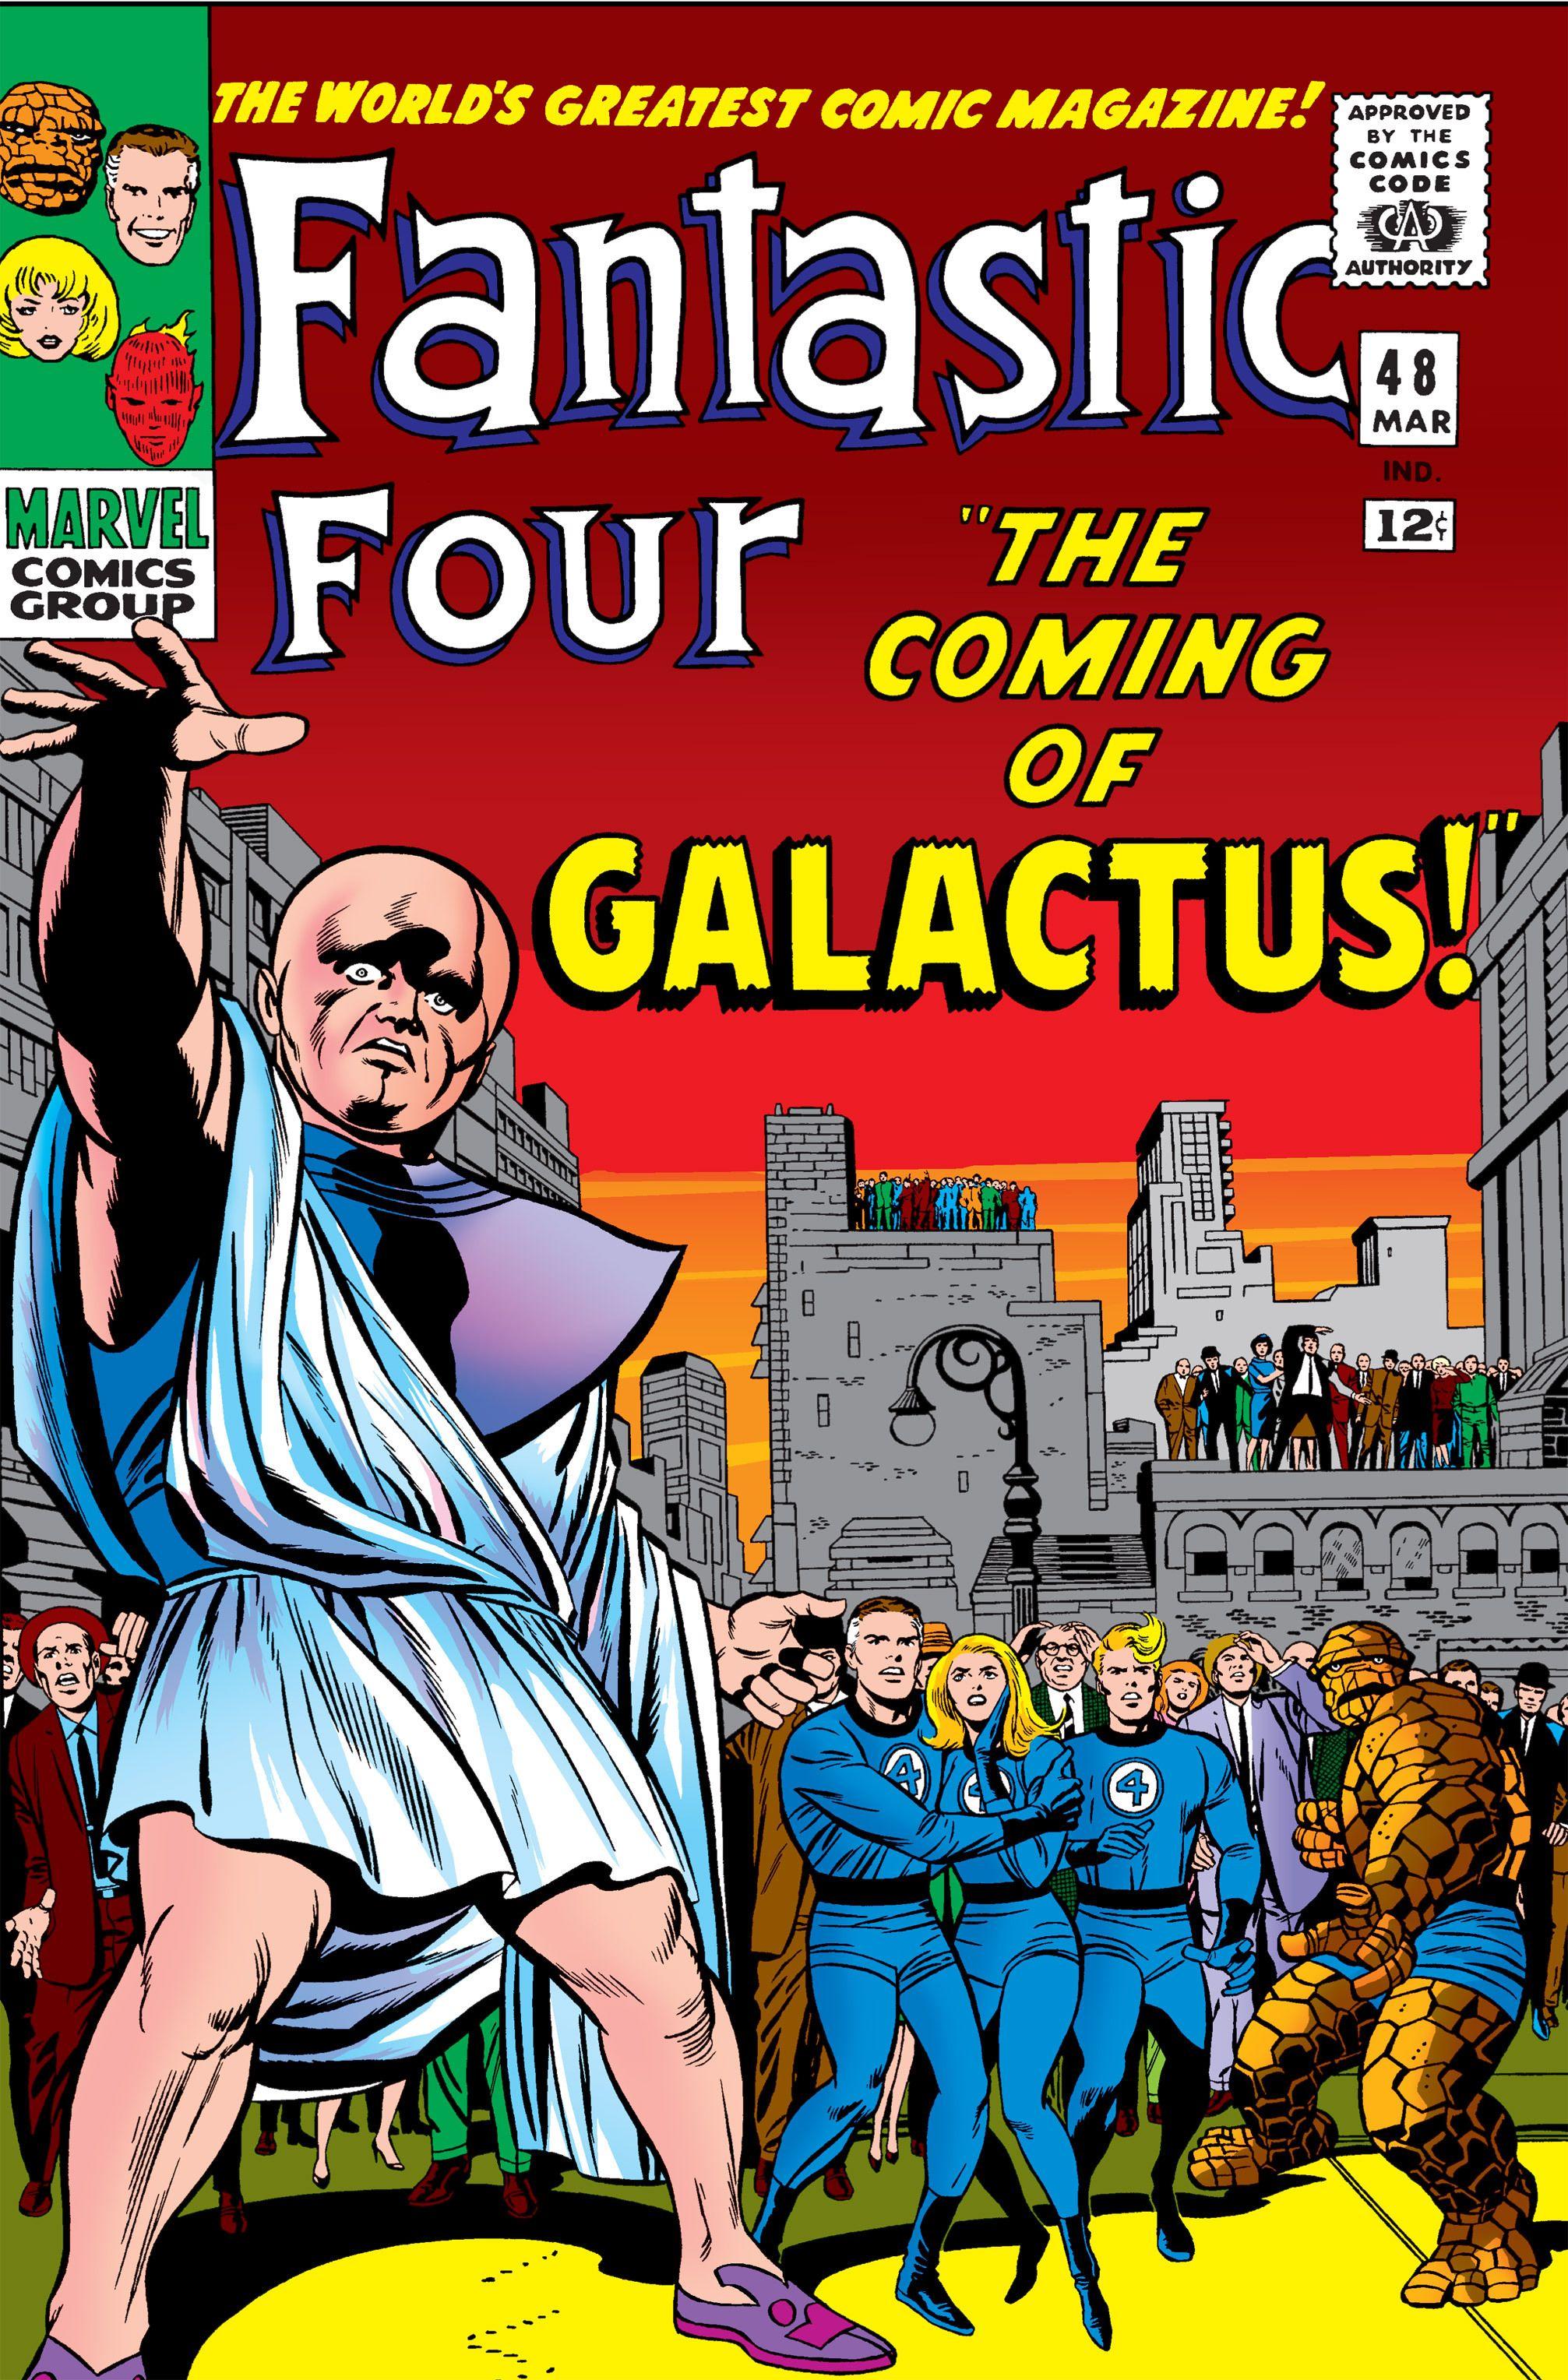 Fantastic Four 1961 Issue 48 Read Fantastic Four 1961 Issue 48 Comic Online In High Qua Fantastic Four Comics Marvel Comic Books Silver Age Comic Books